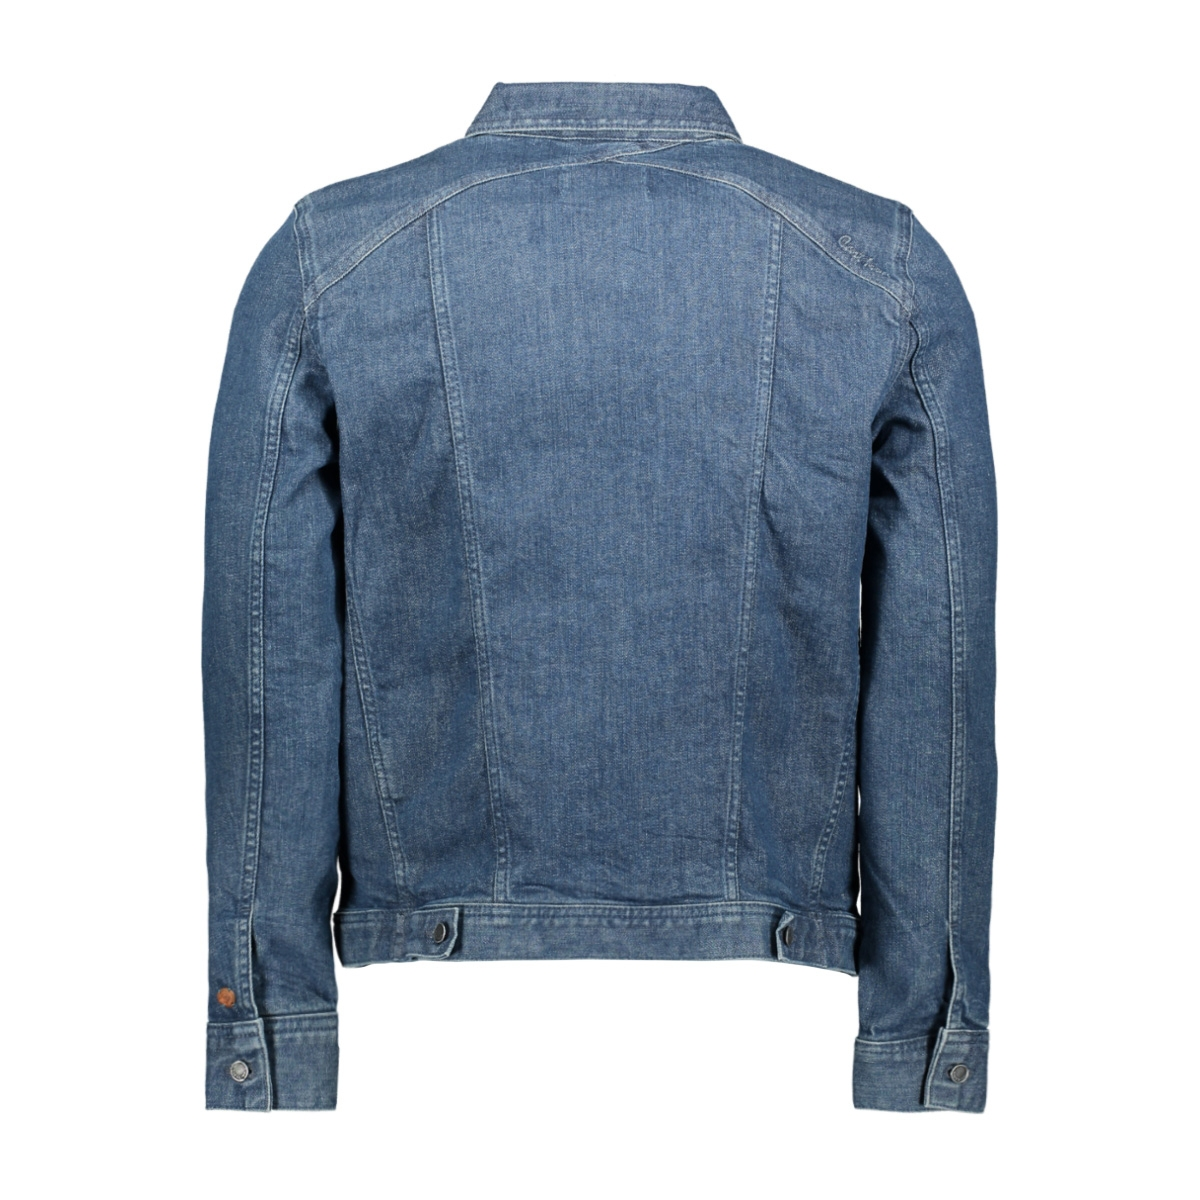 denim jacket mid blue used cdj201500 cast iron jas mbw